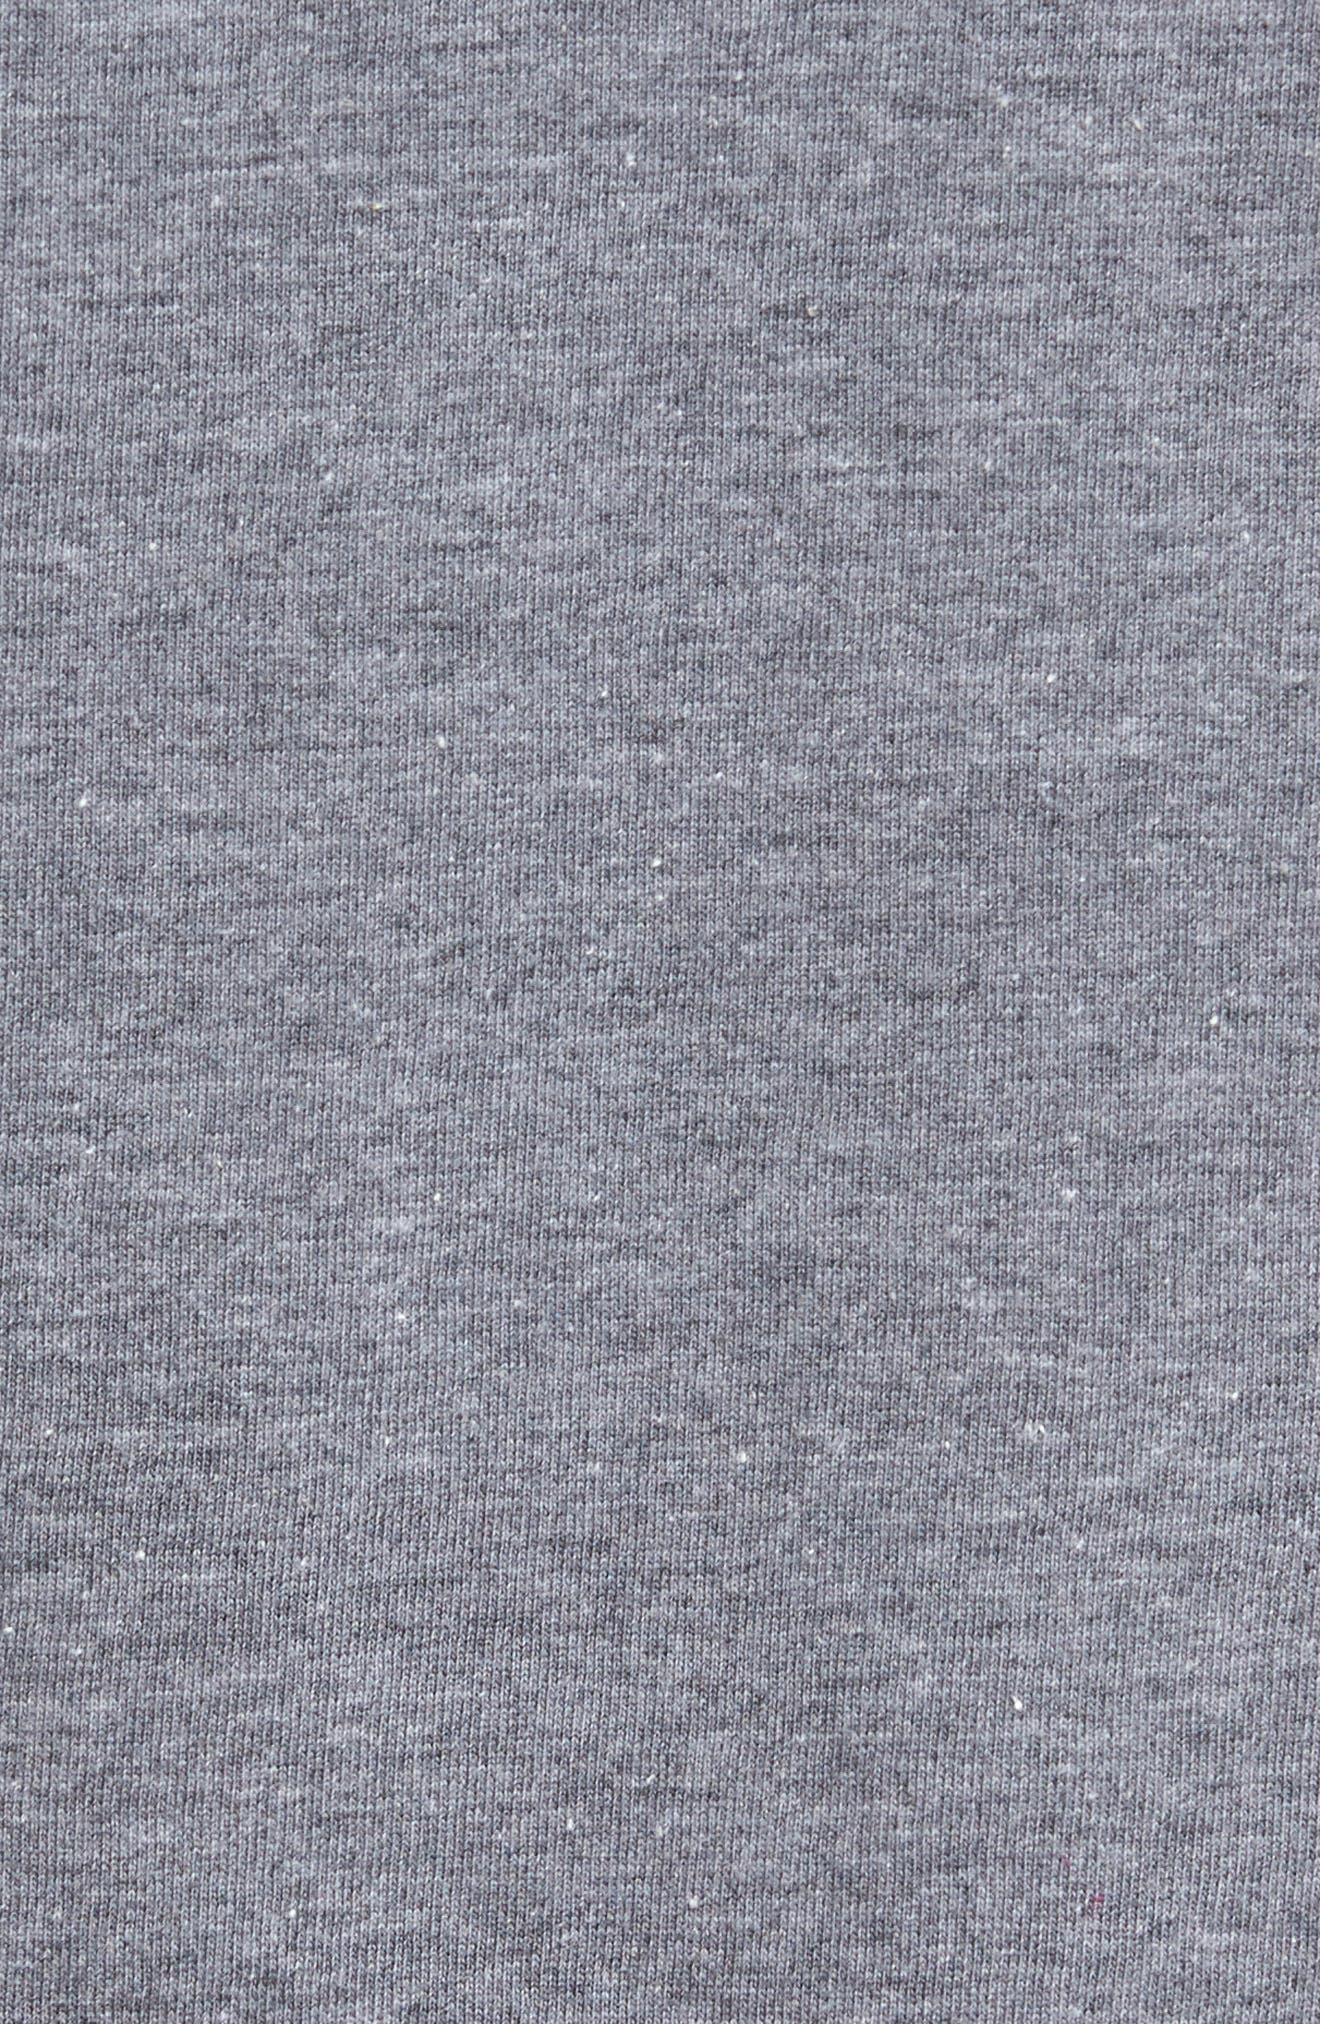 Planer Raglan T-Shirt,                             Alternate thumbnail 5, color,                             Grey W/ Black